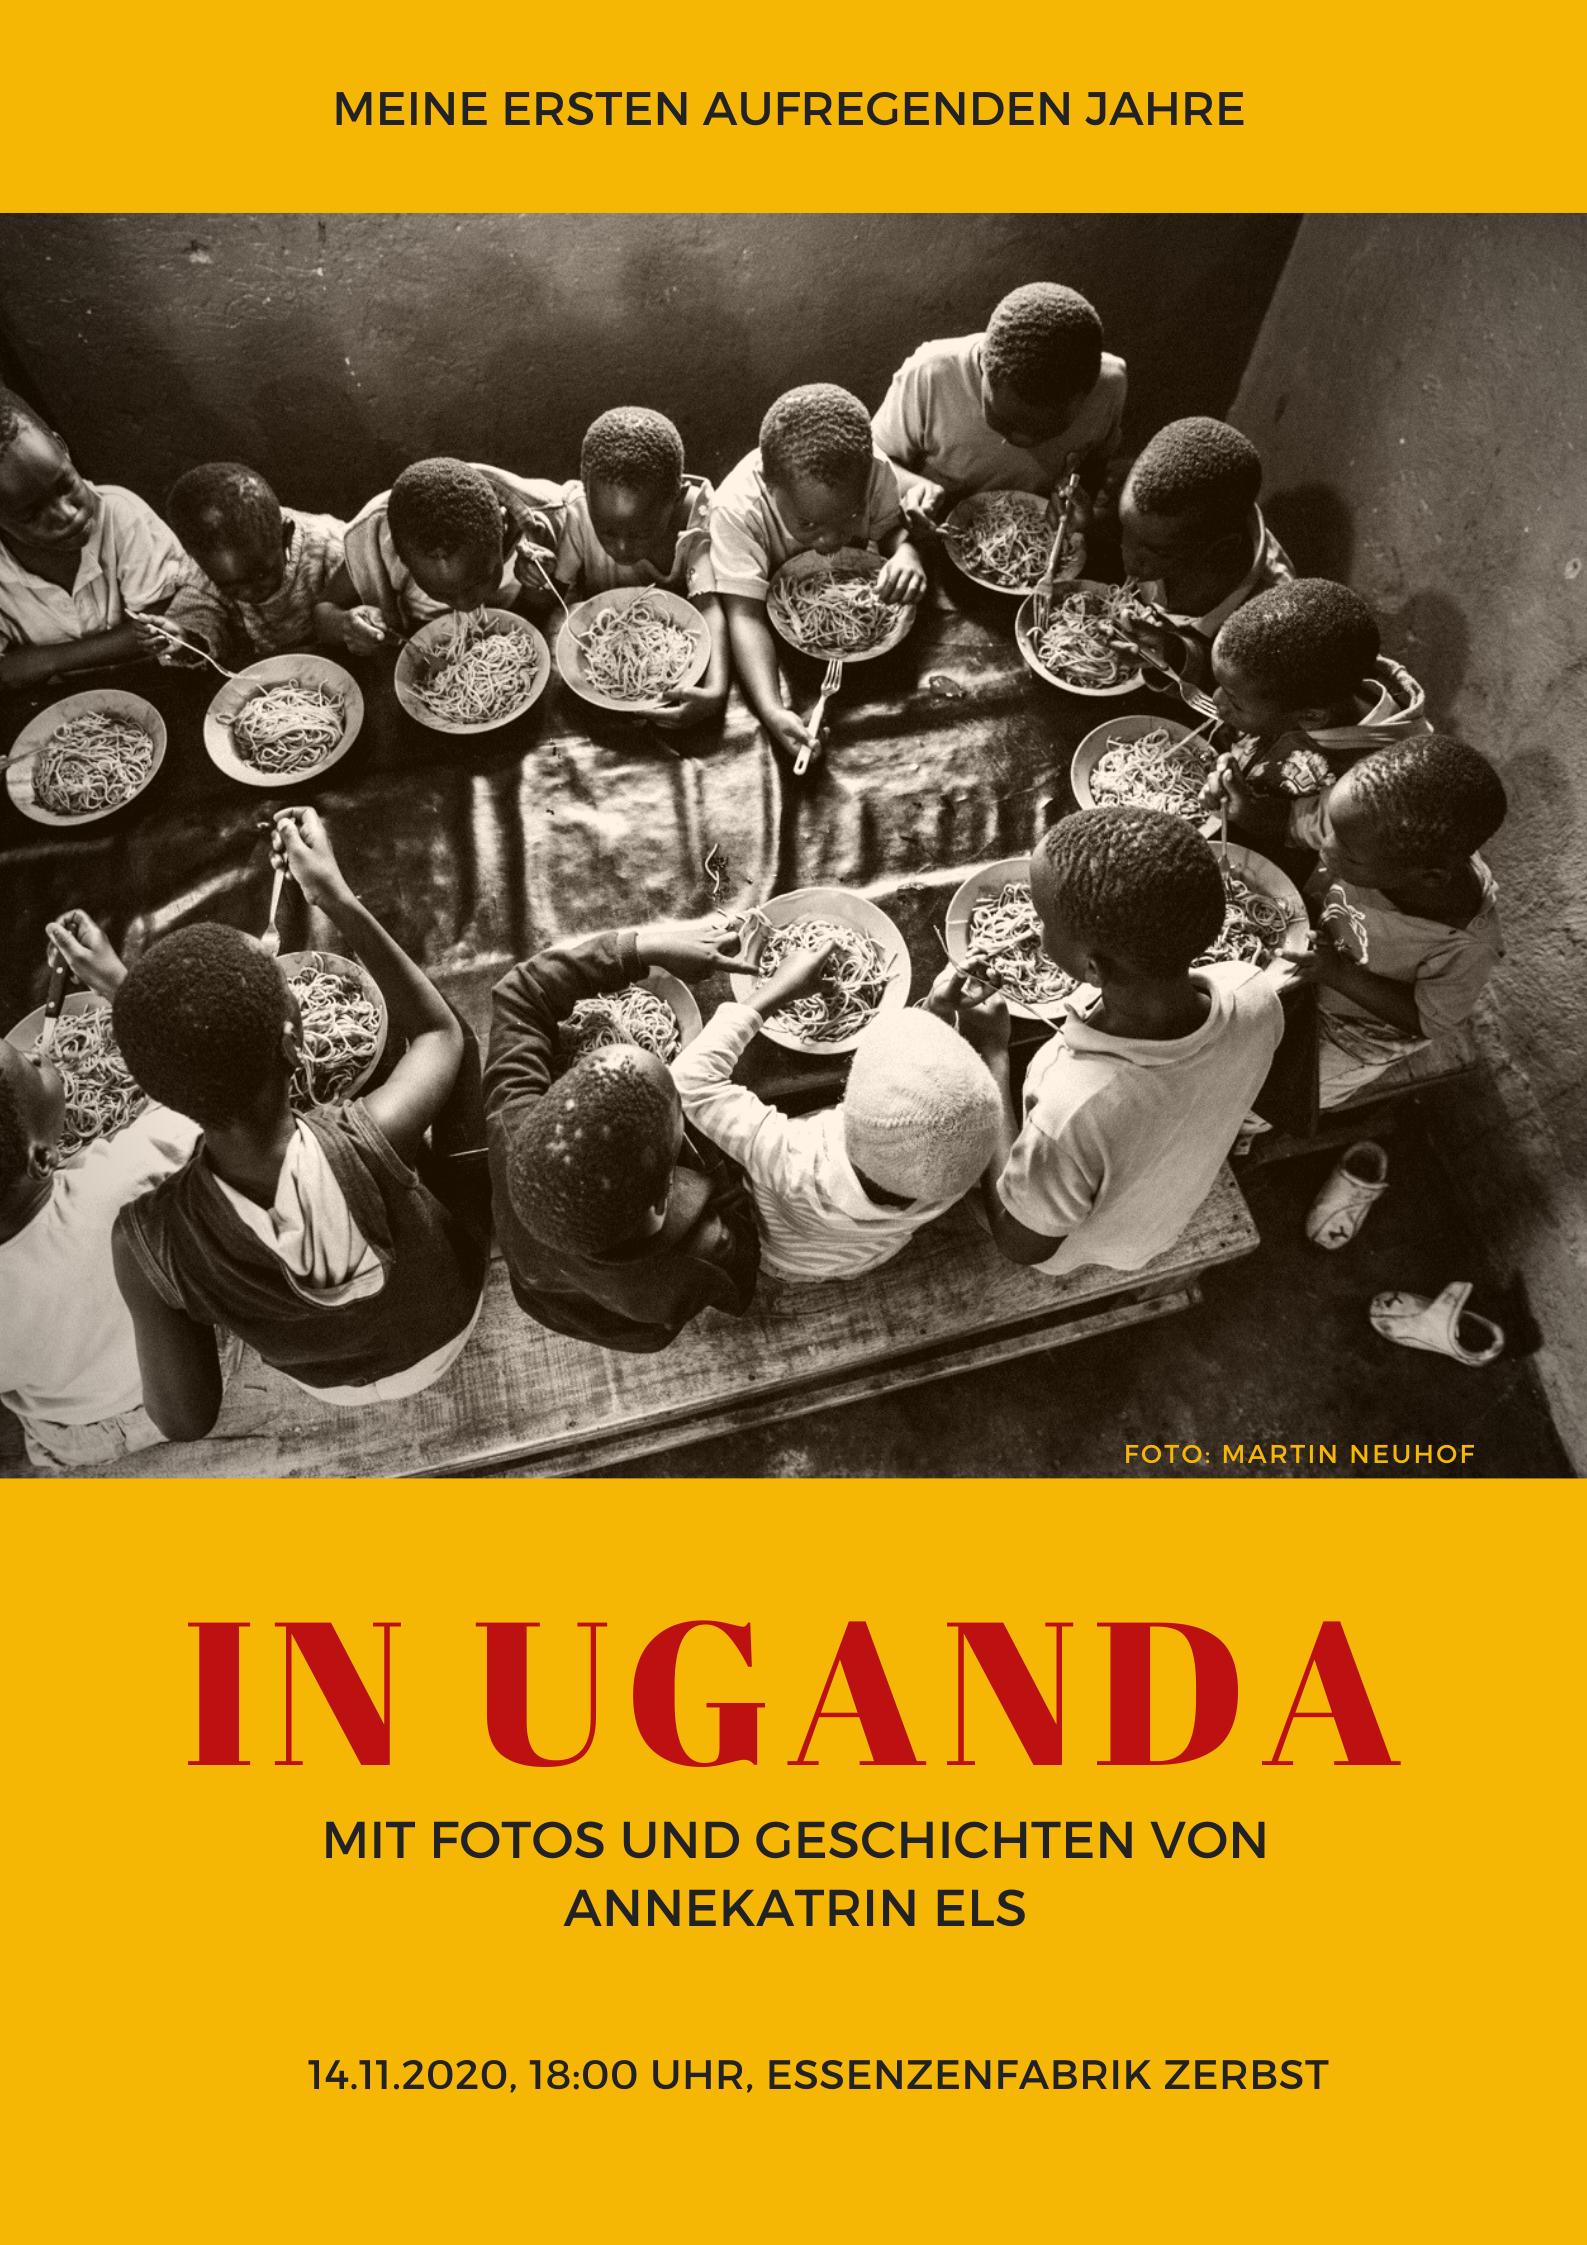 In Uganda. Foto von Martin Neuhof.